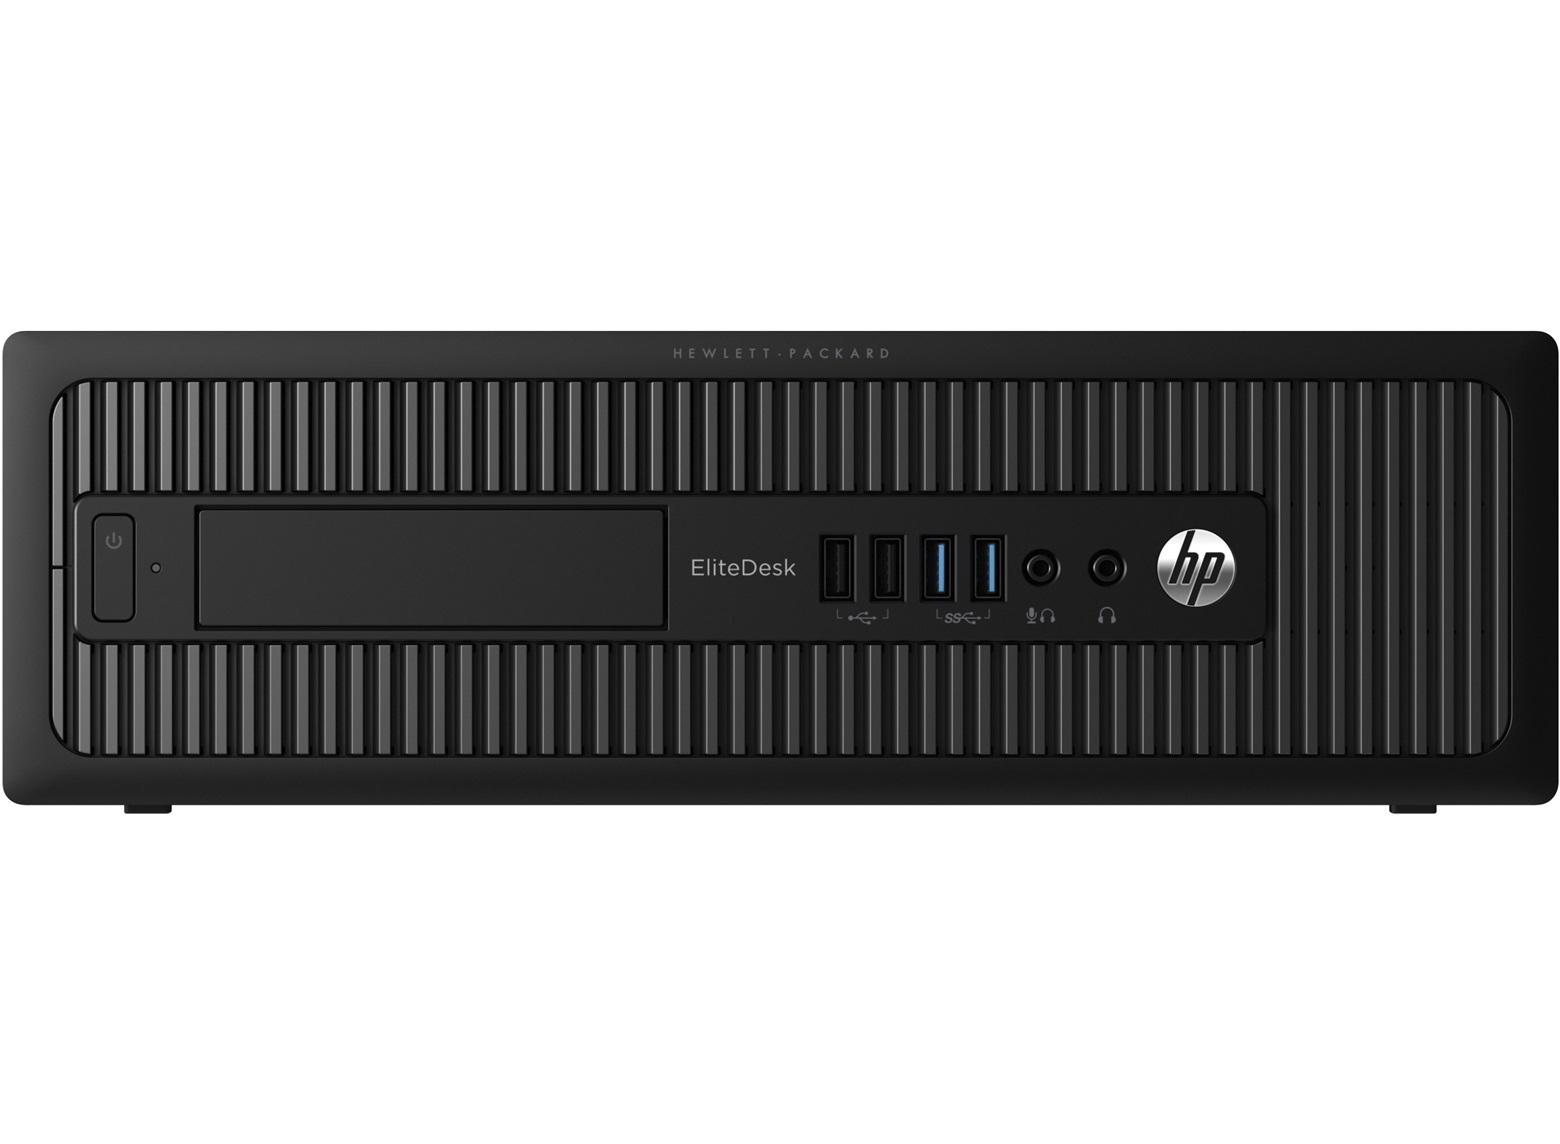 HP EliteDesk 705 G2 3.5GHz A4 PRO-8350B SFF Black